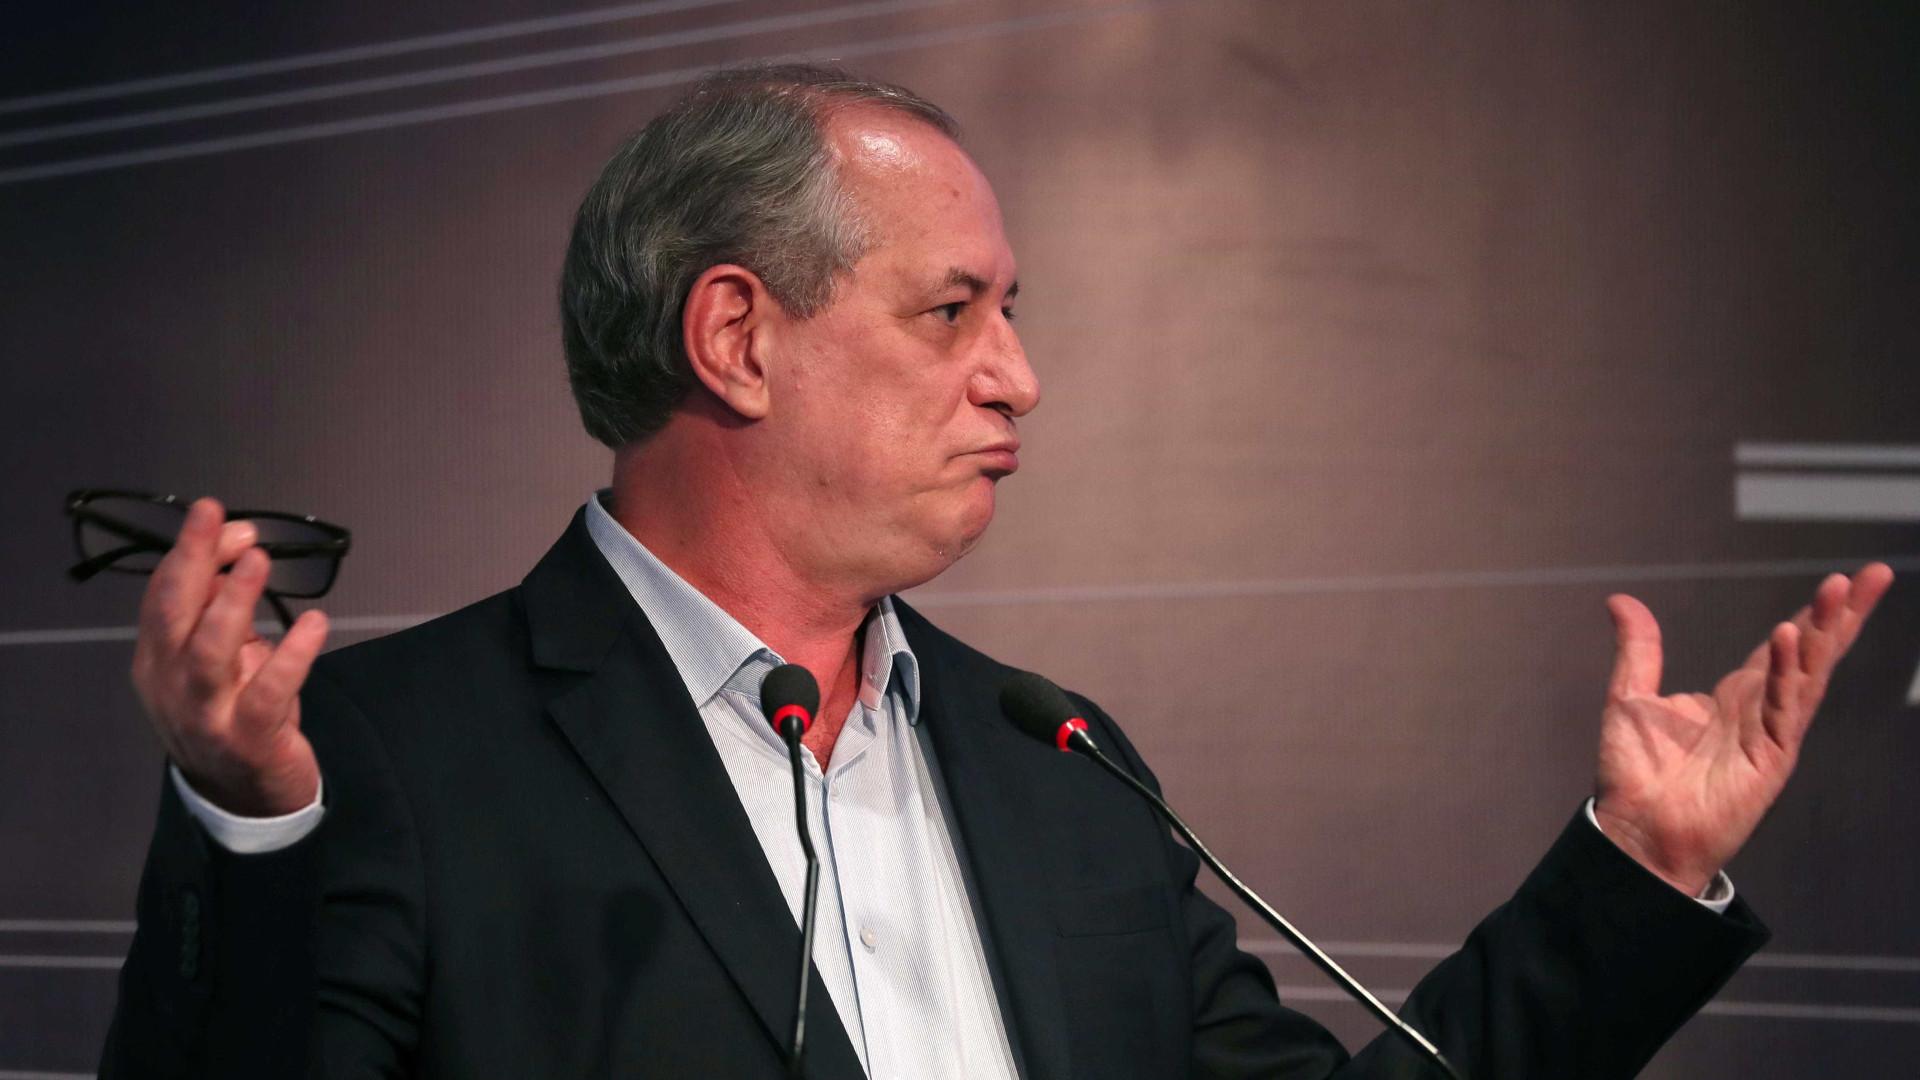 Ciro chama Bolsonaro de 'nazista filho da p***' durante discurso; vídeo